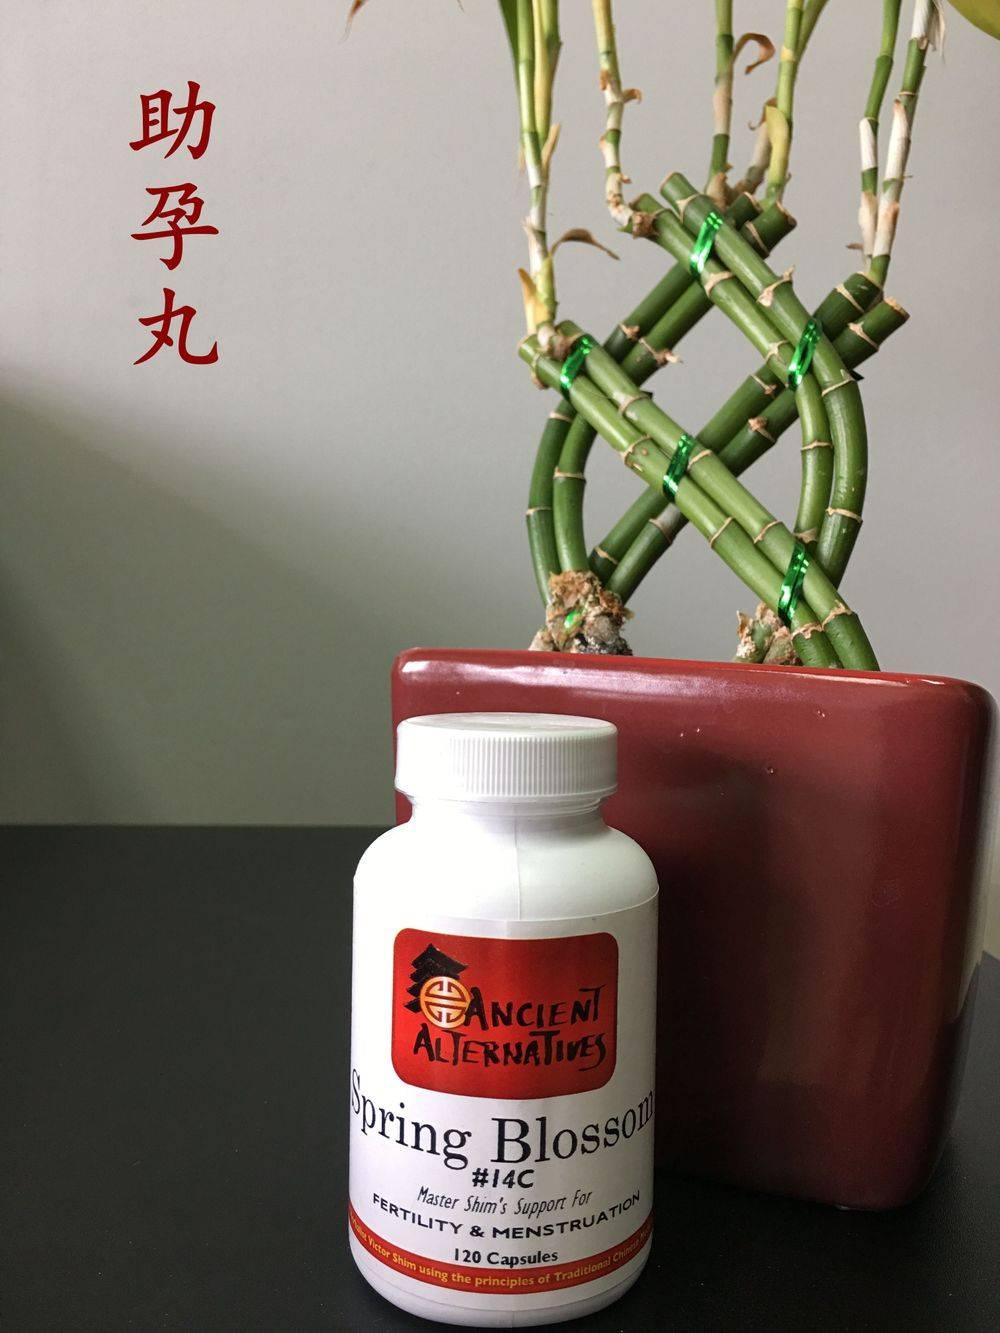 Help menstrual cramps, pain and increase fertility. For men, increase circulation. (120 capsules)